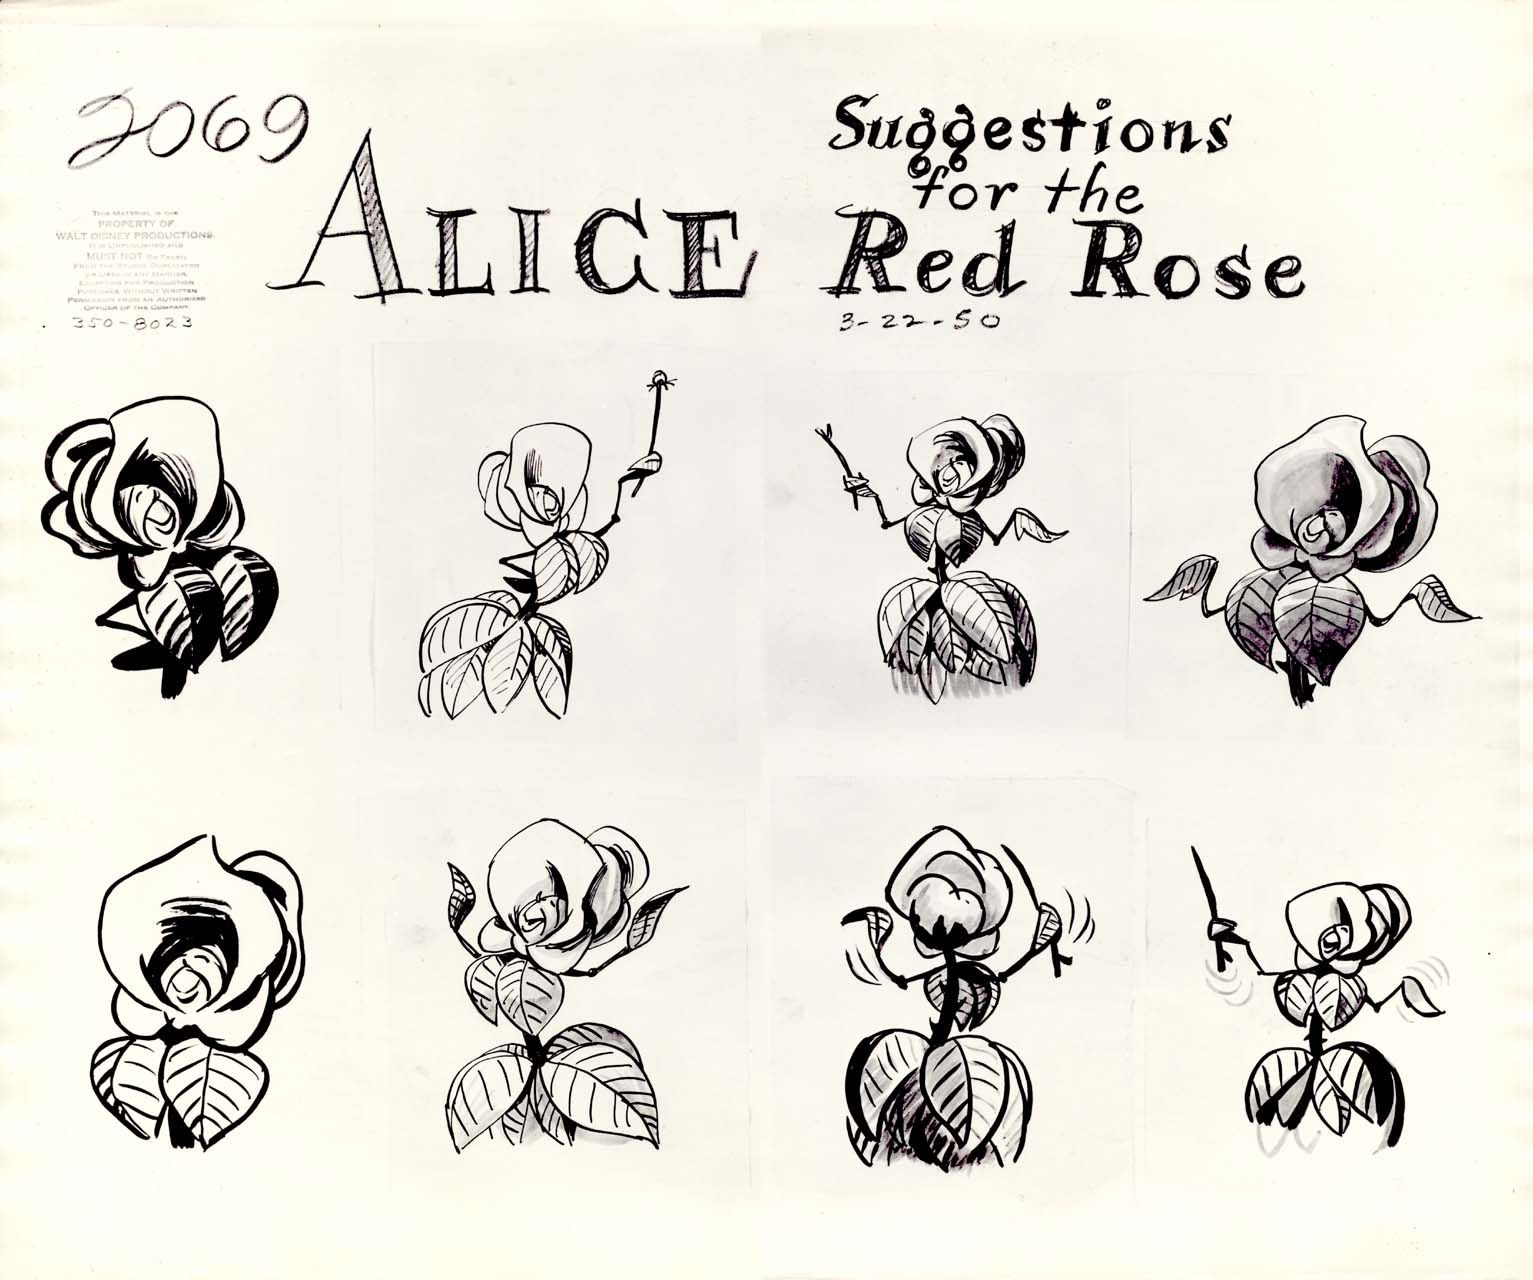 Animation Model Sheet 350 8023 Flower Suggestions For The Red Rose Alice In Wonderland Flowers Wonderland Tattoo Disney Tattoos